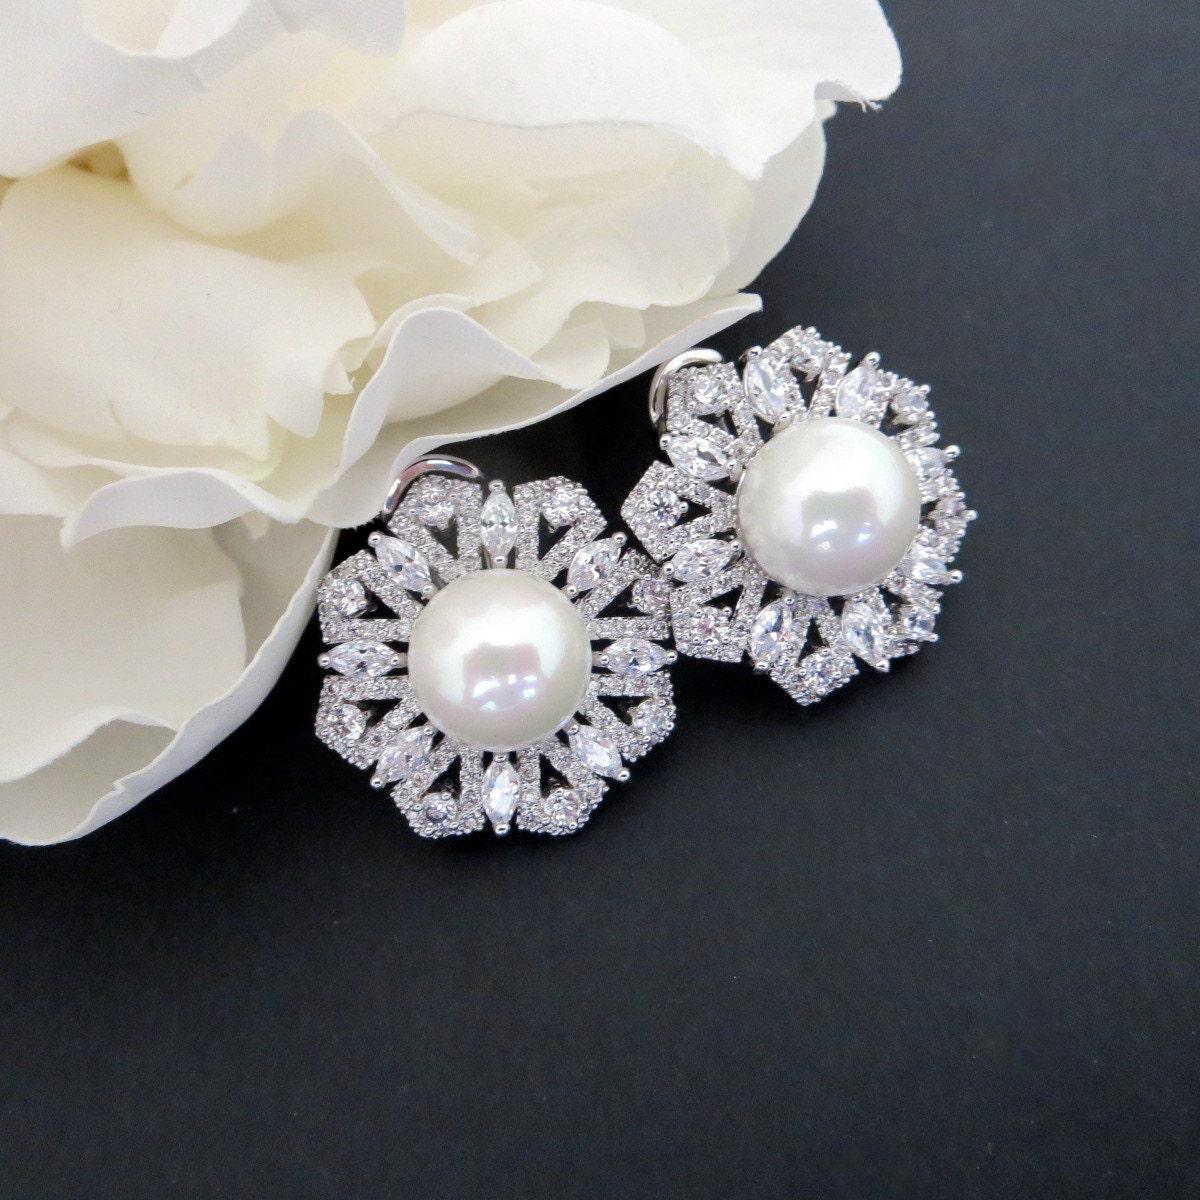 pearl stud earrings cz wedding earrings bridal earrings